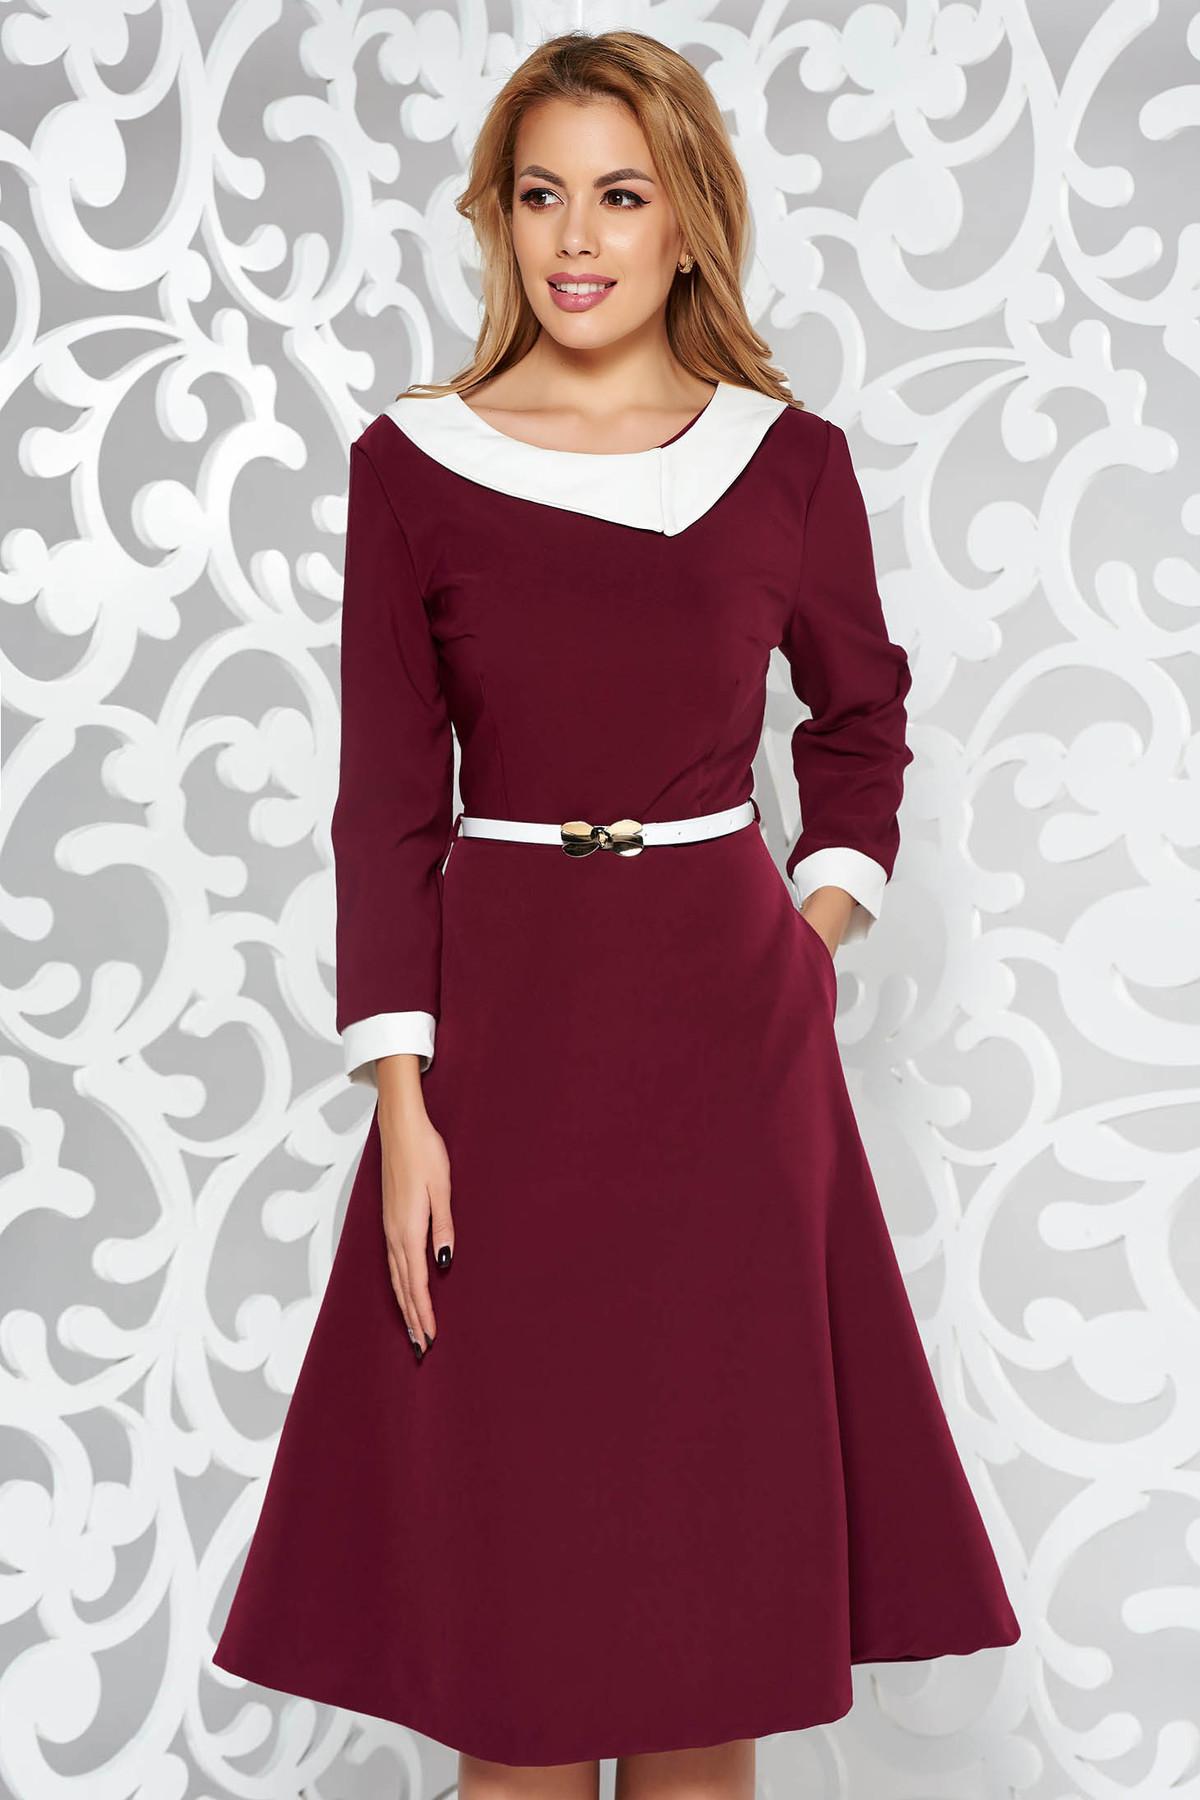 Rochie visinie eleganta in clos din stofa subtire usor elastica cu accesoriu tip curea